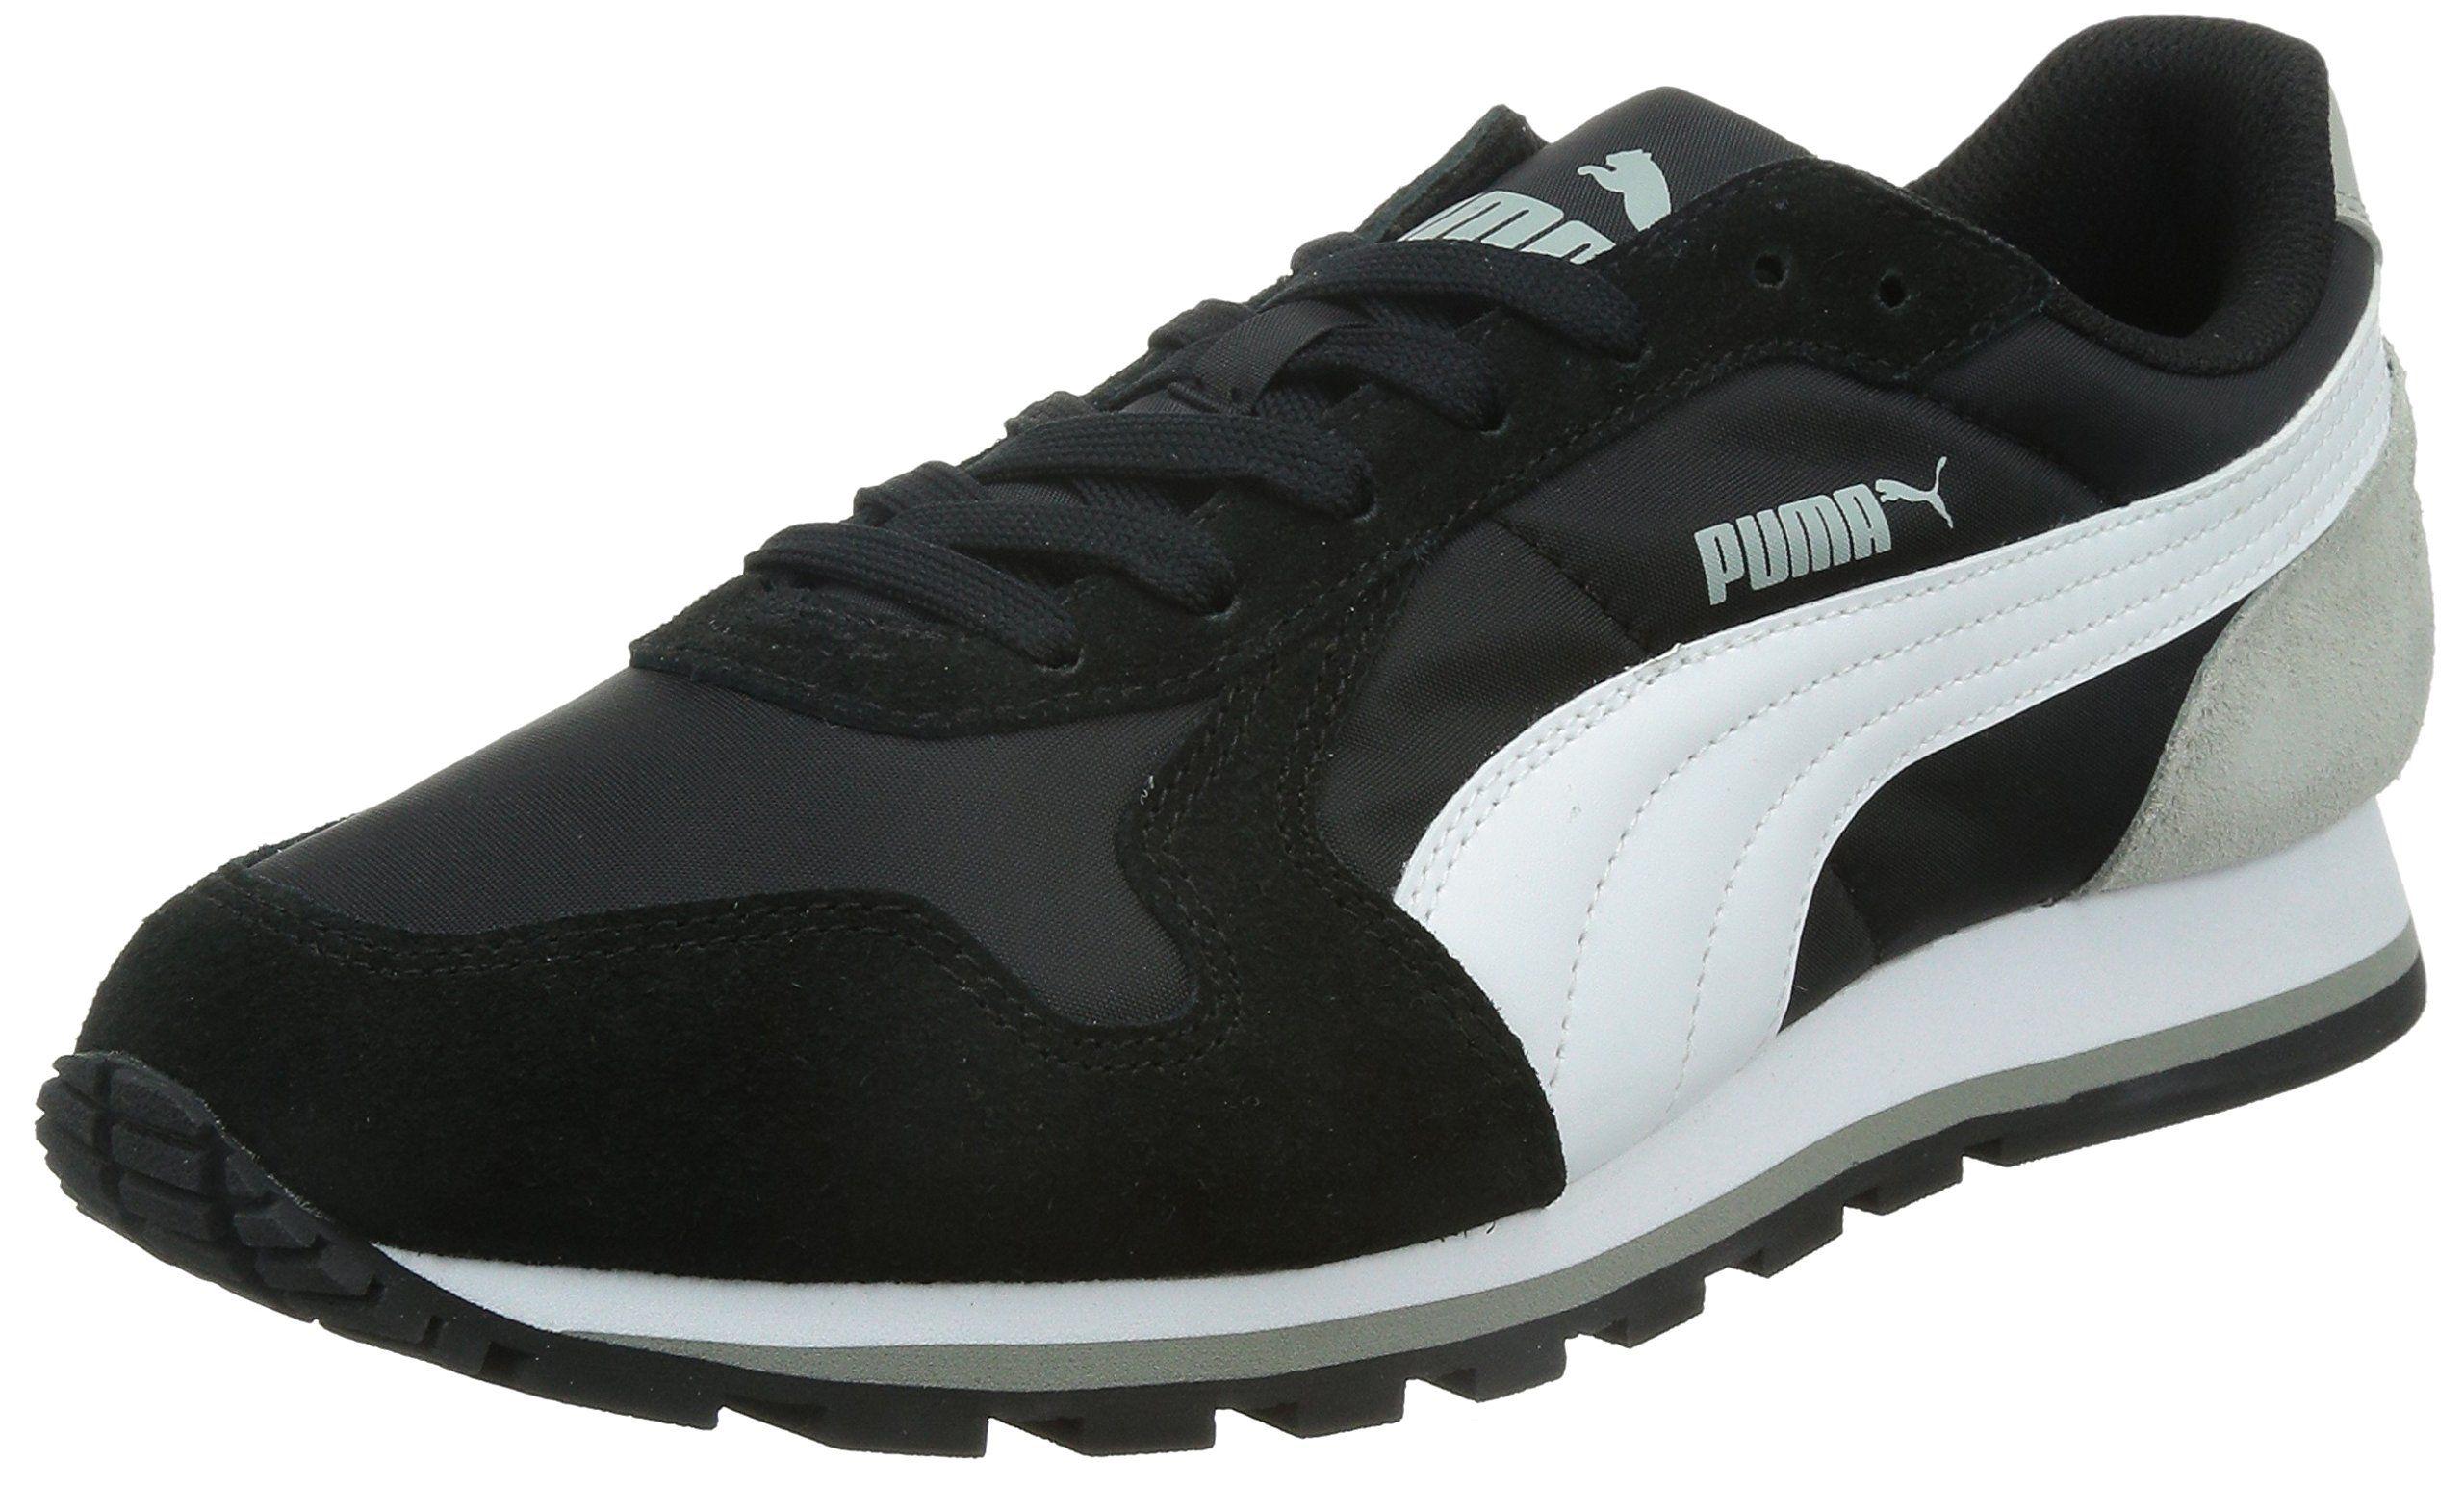 Unisexe Jogger Et Erwachsene Pumas Sneaker 8drHDo2m9